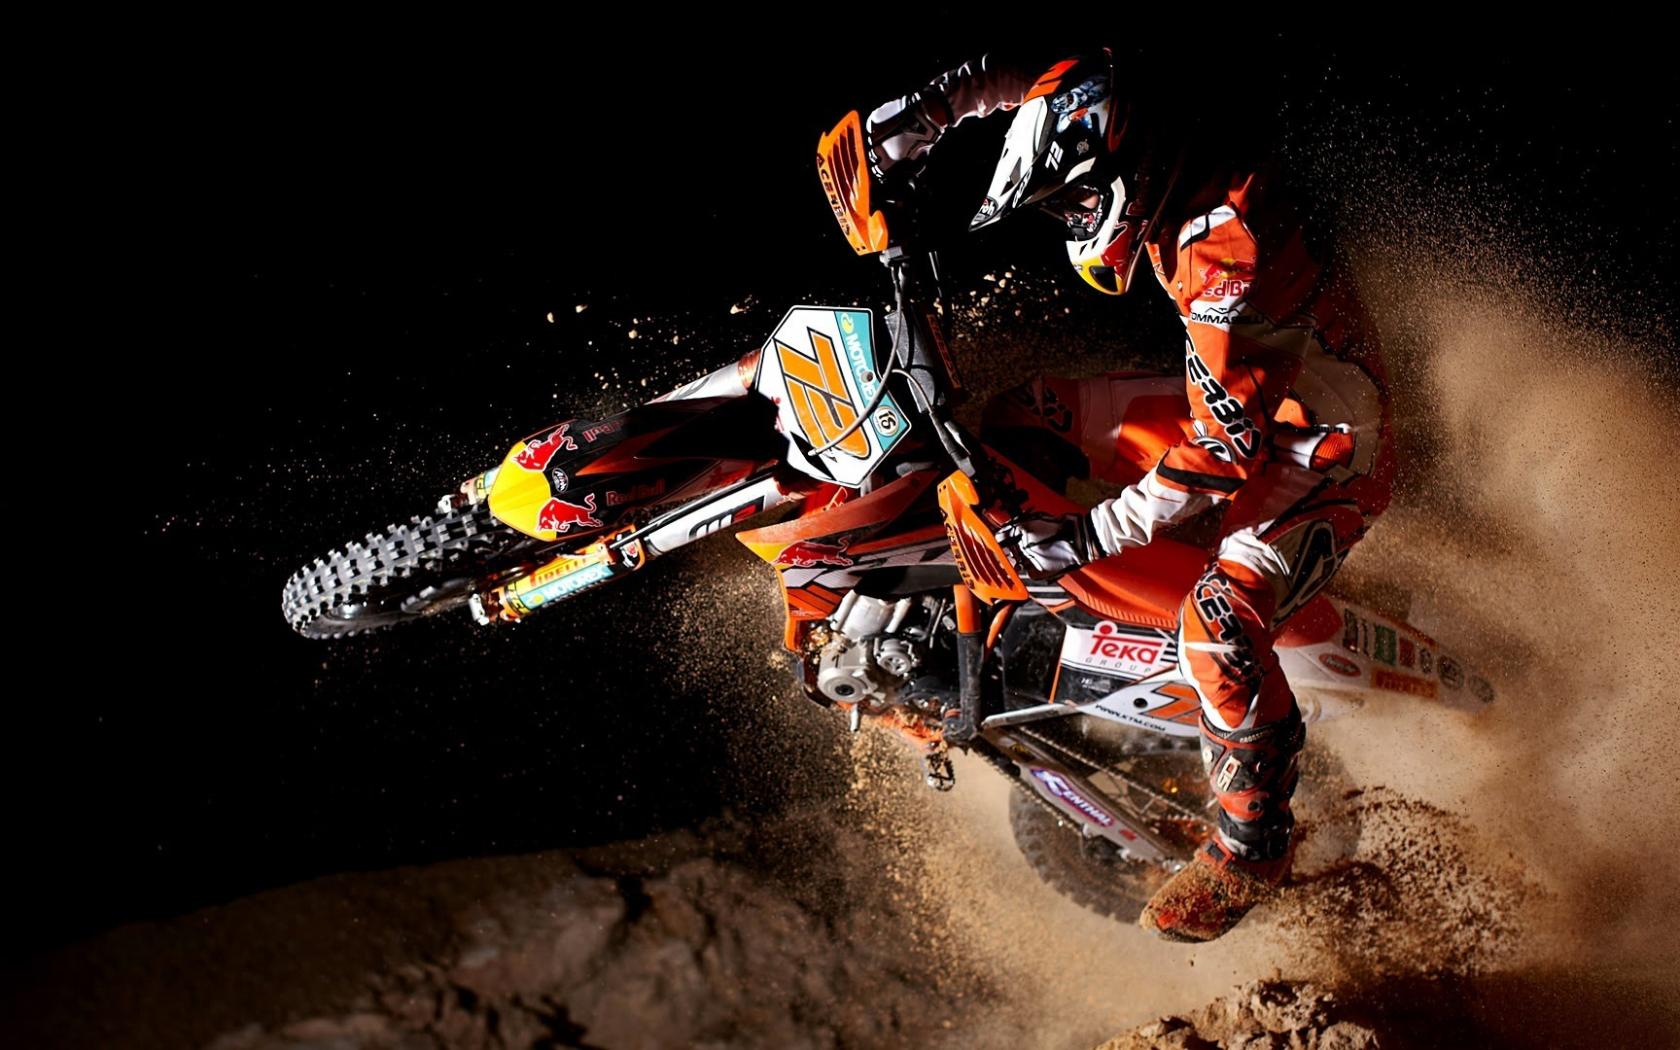 motorcycles dirt track racing race ktm bike wallpaper background 1680x1050